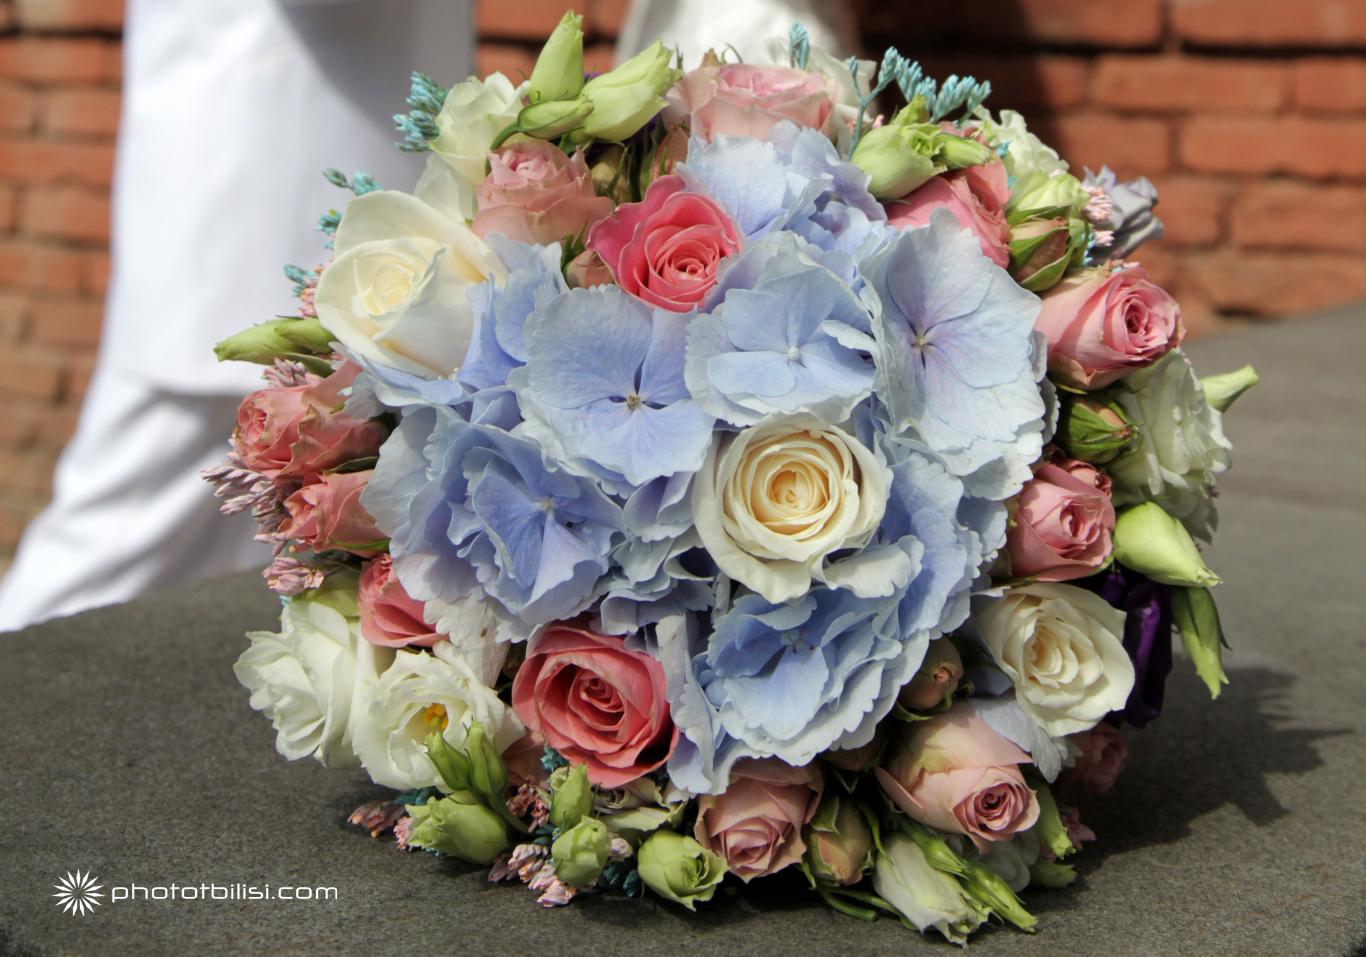 bouquet, Tbilisi, marriage, wedding, buy